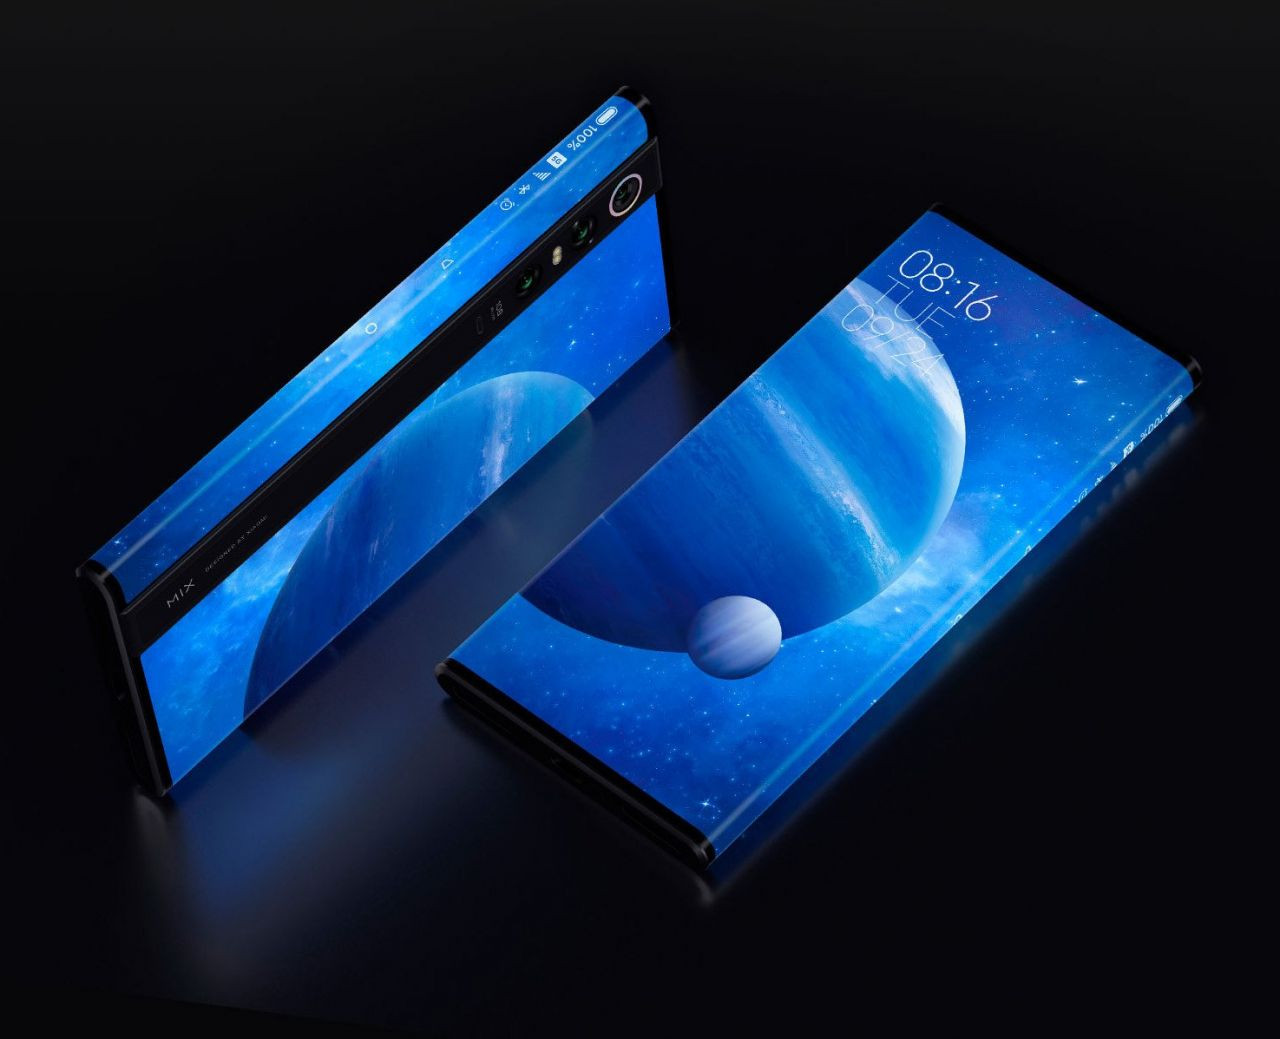 En iyi Xiaomi telefon modelleri – Mart 2021 - Page 1